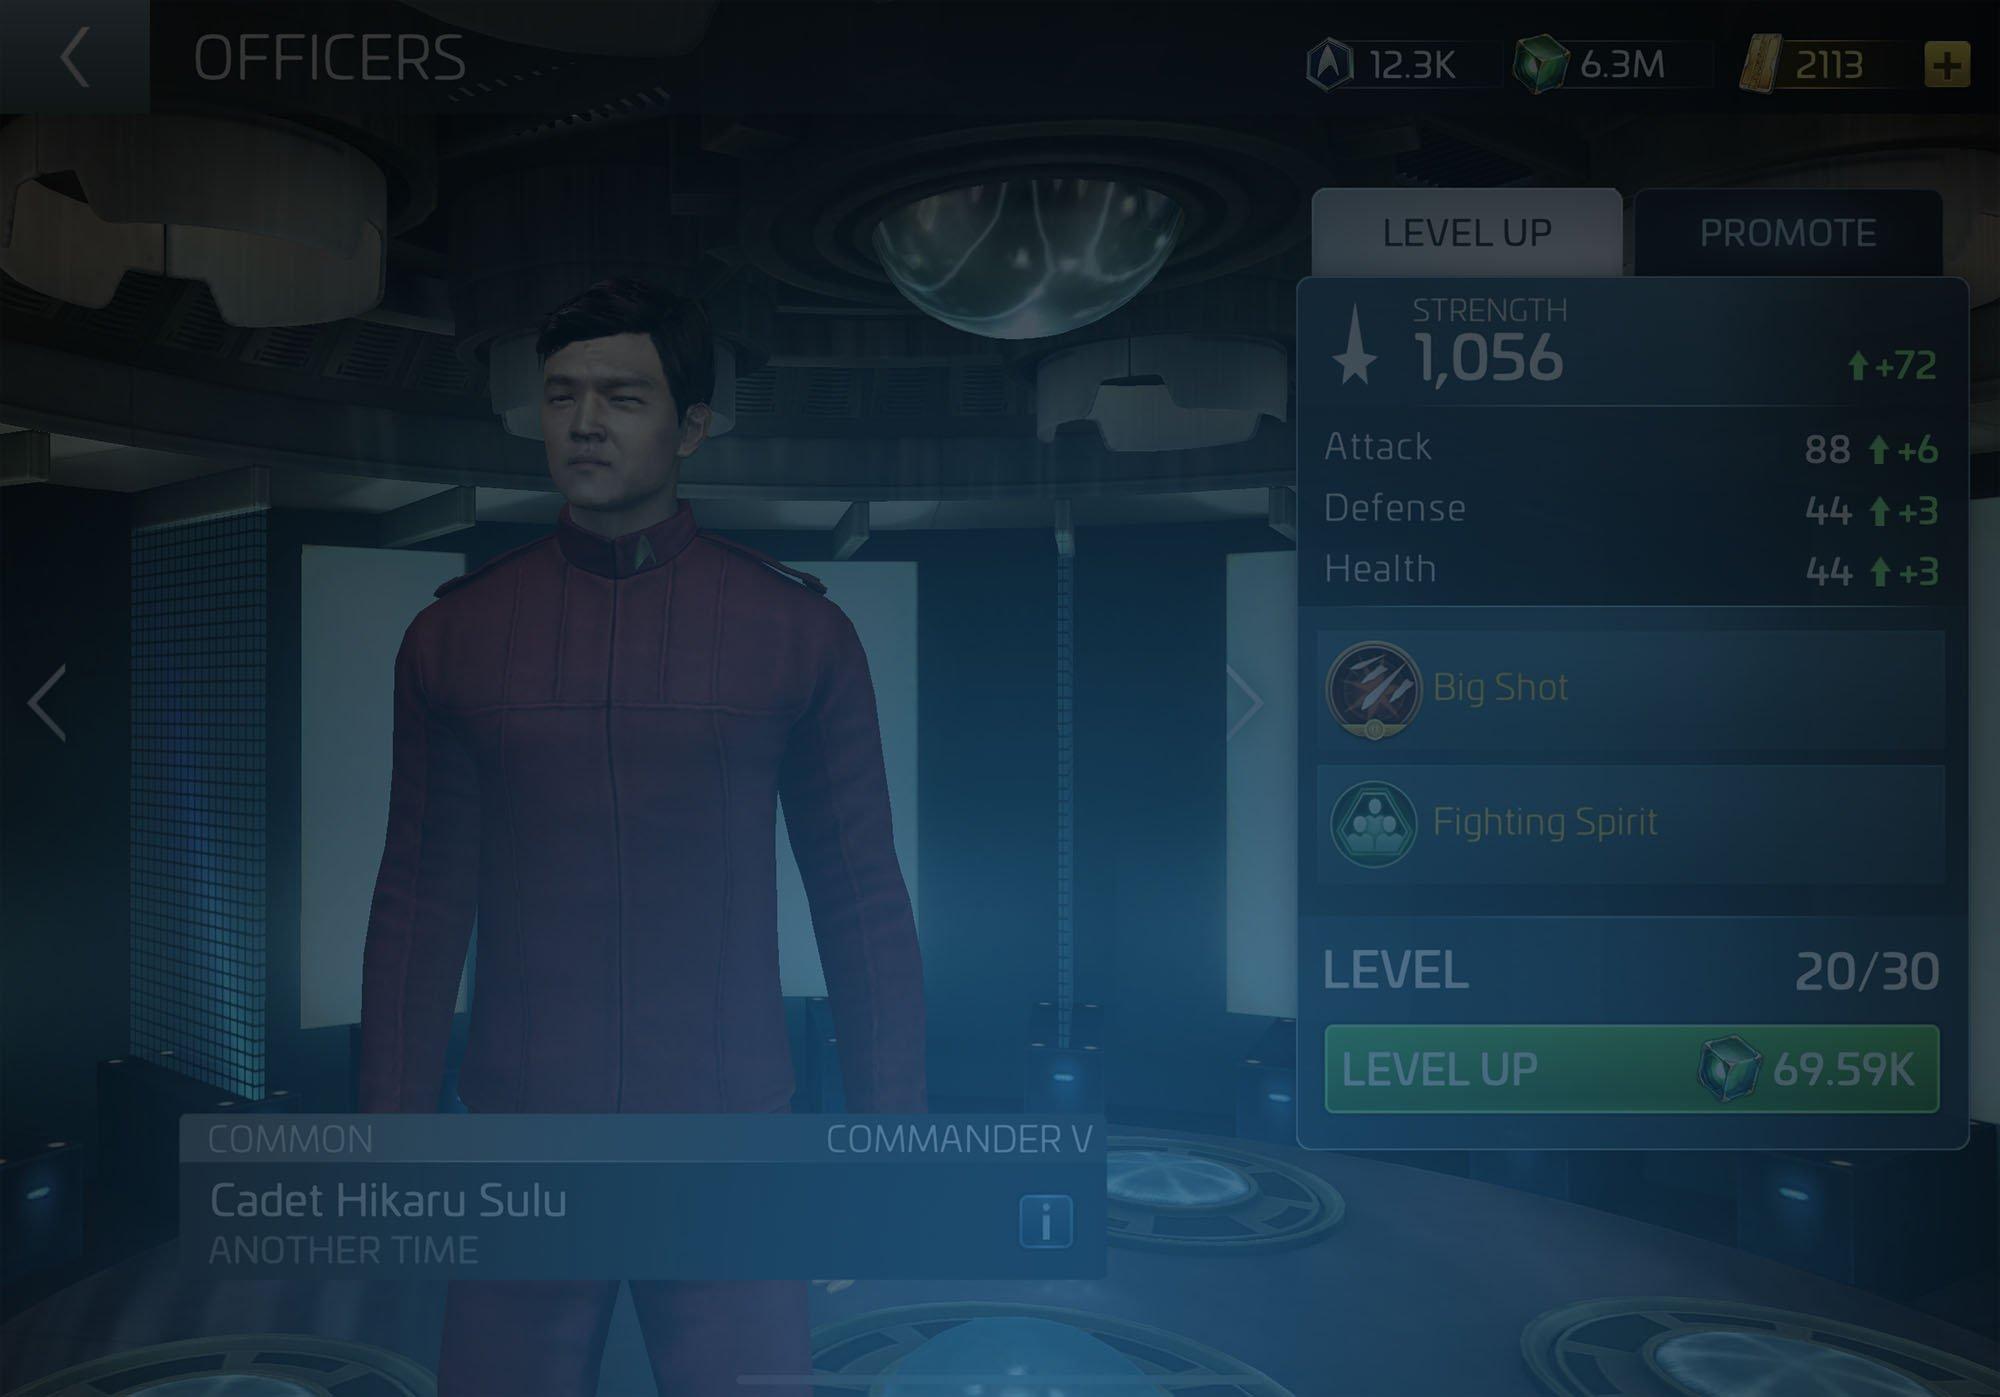 Cadet Hikaru Sulu